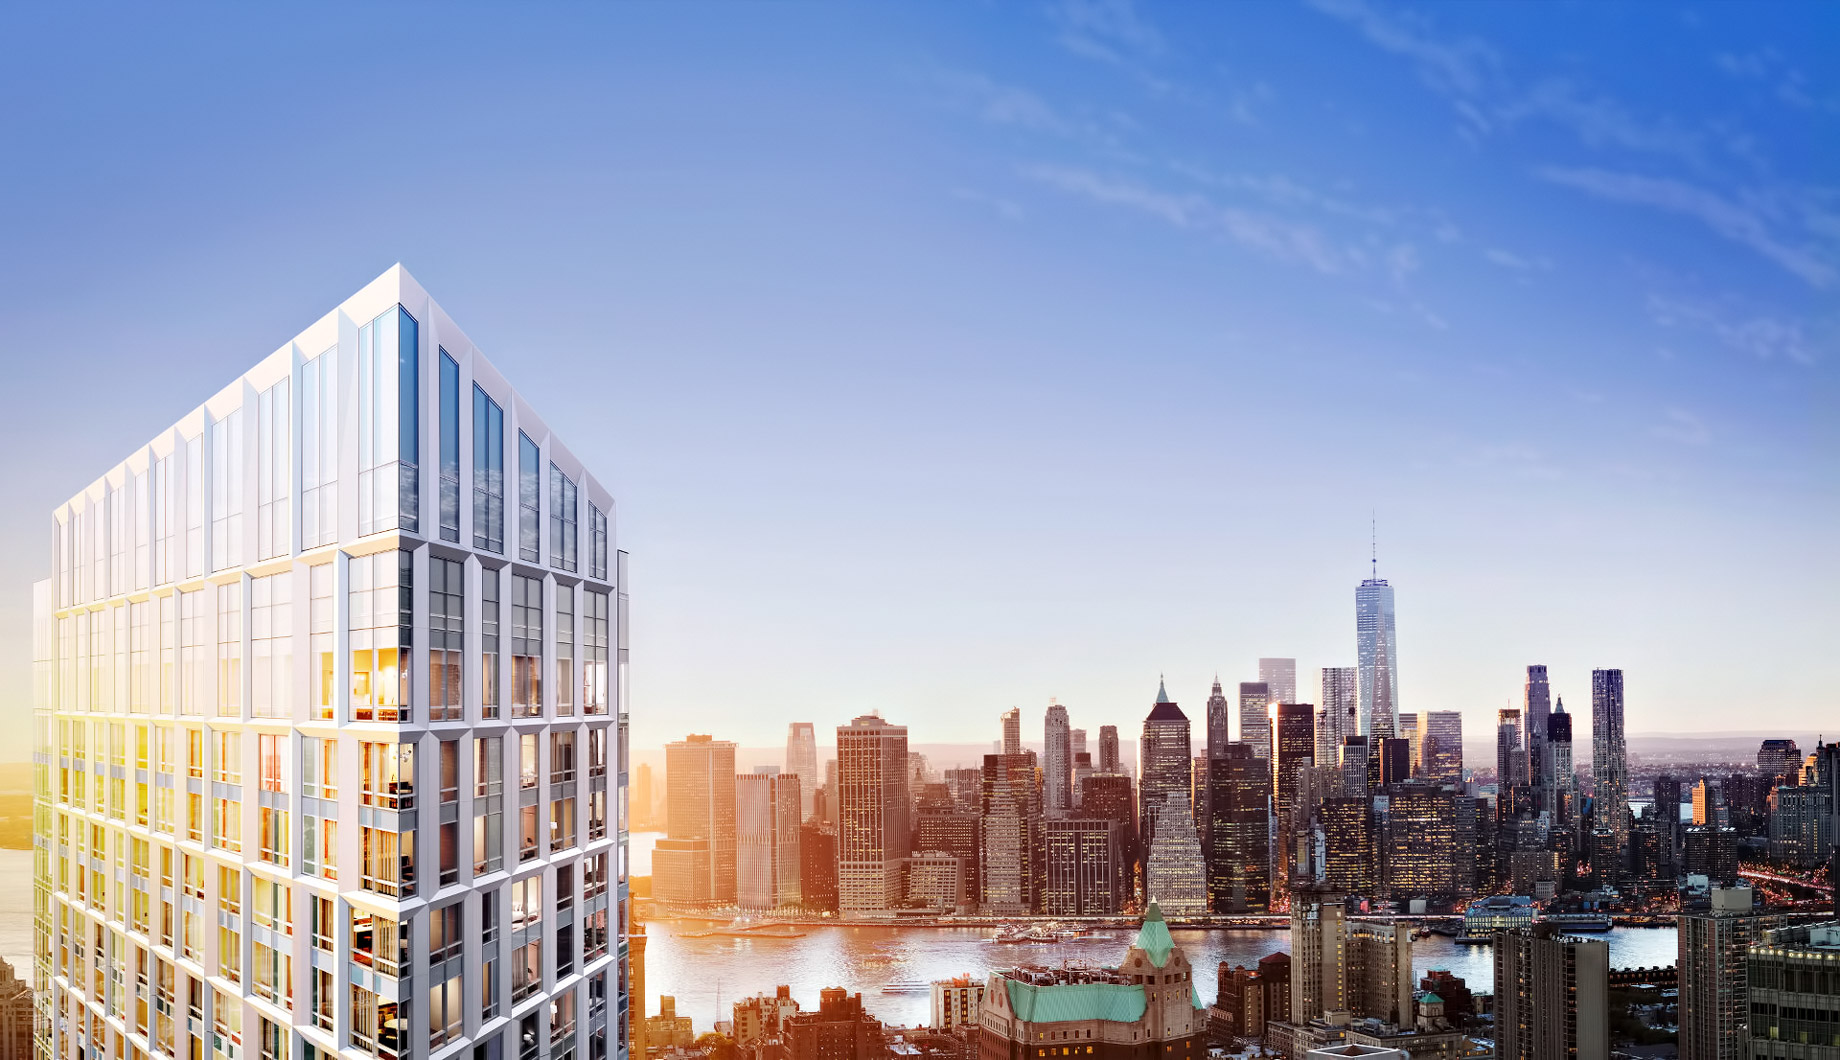 Brooklyn Point Luxury Condo Apartments – 138 Willoughby St, Brooklyn, NY, USA